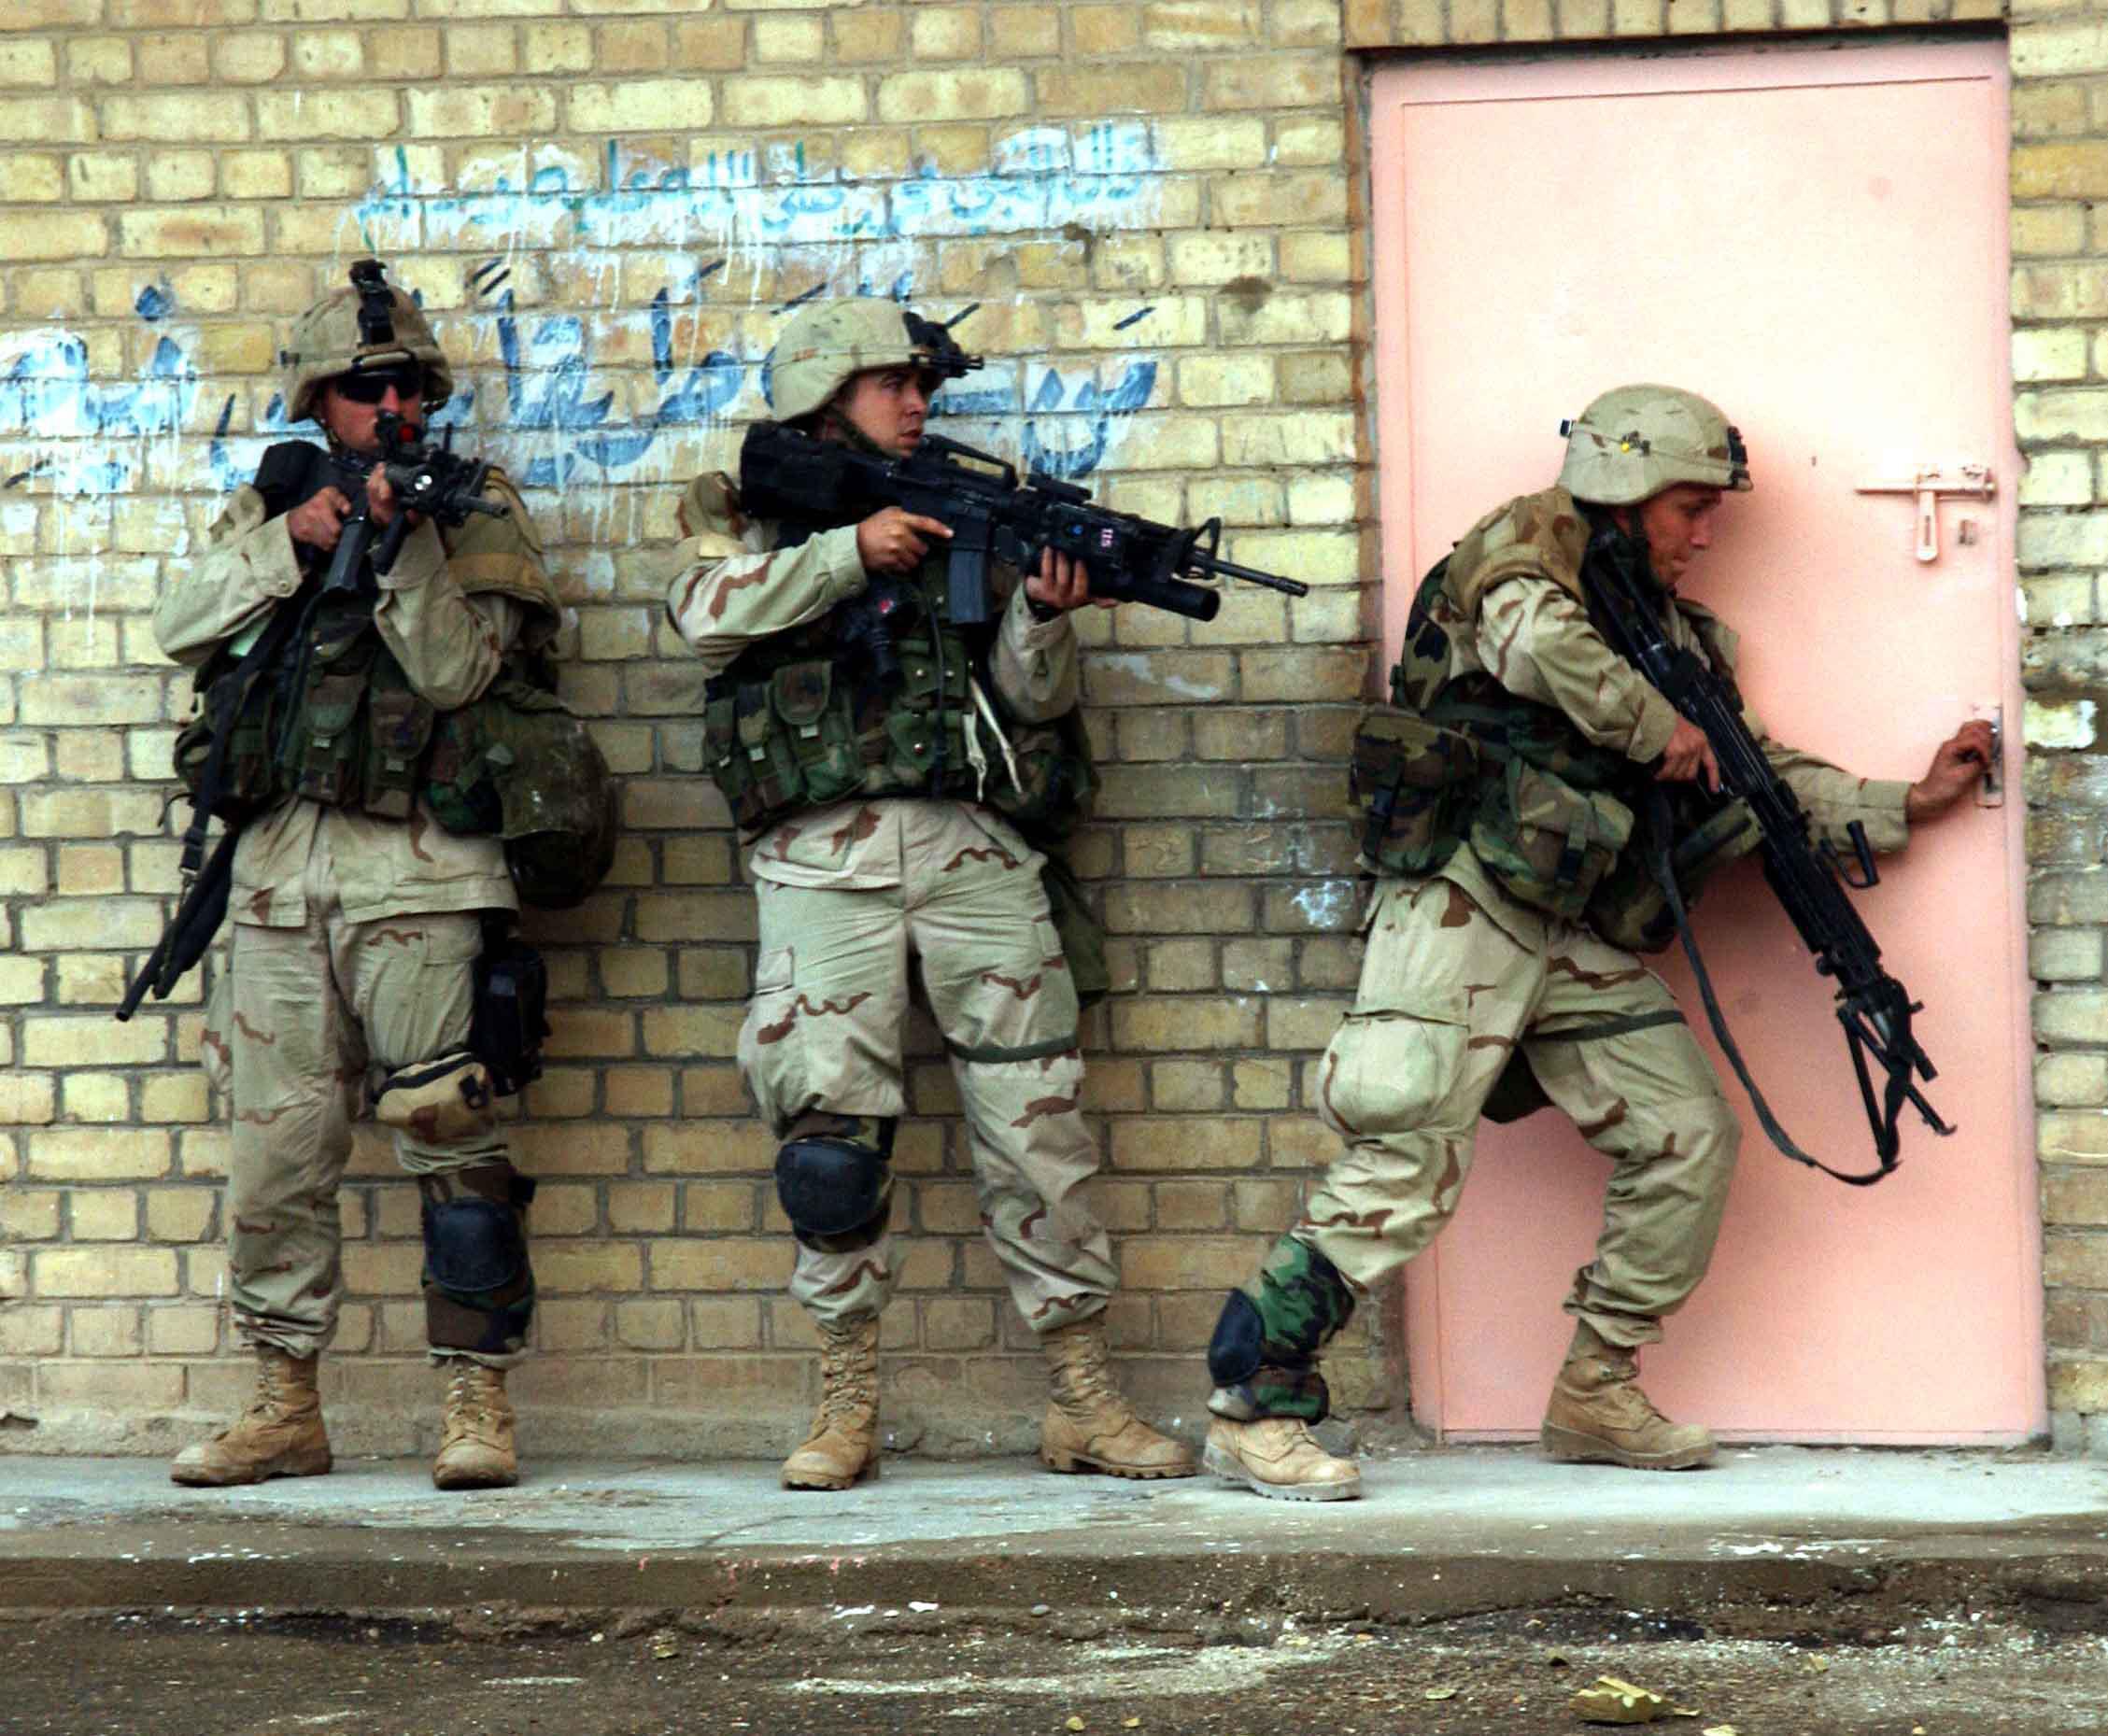 US_1stCavDiv_Fallujah,_Nov_12,_2004 (1).jpg